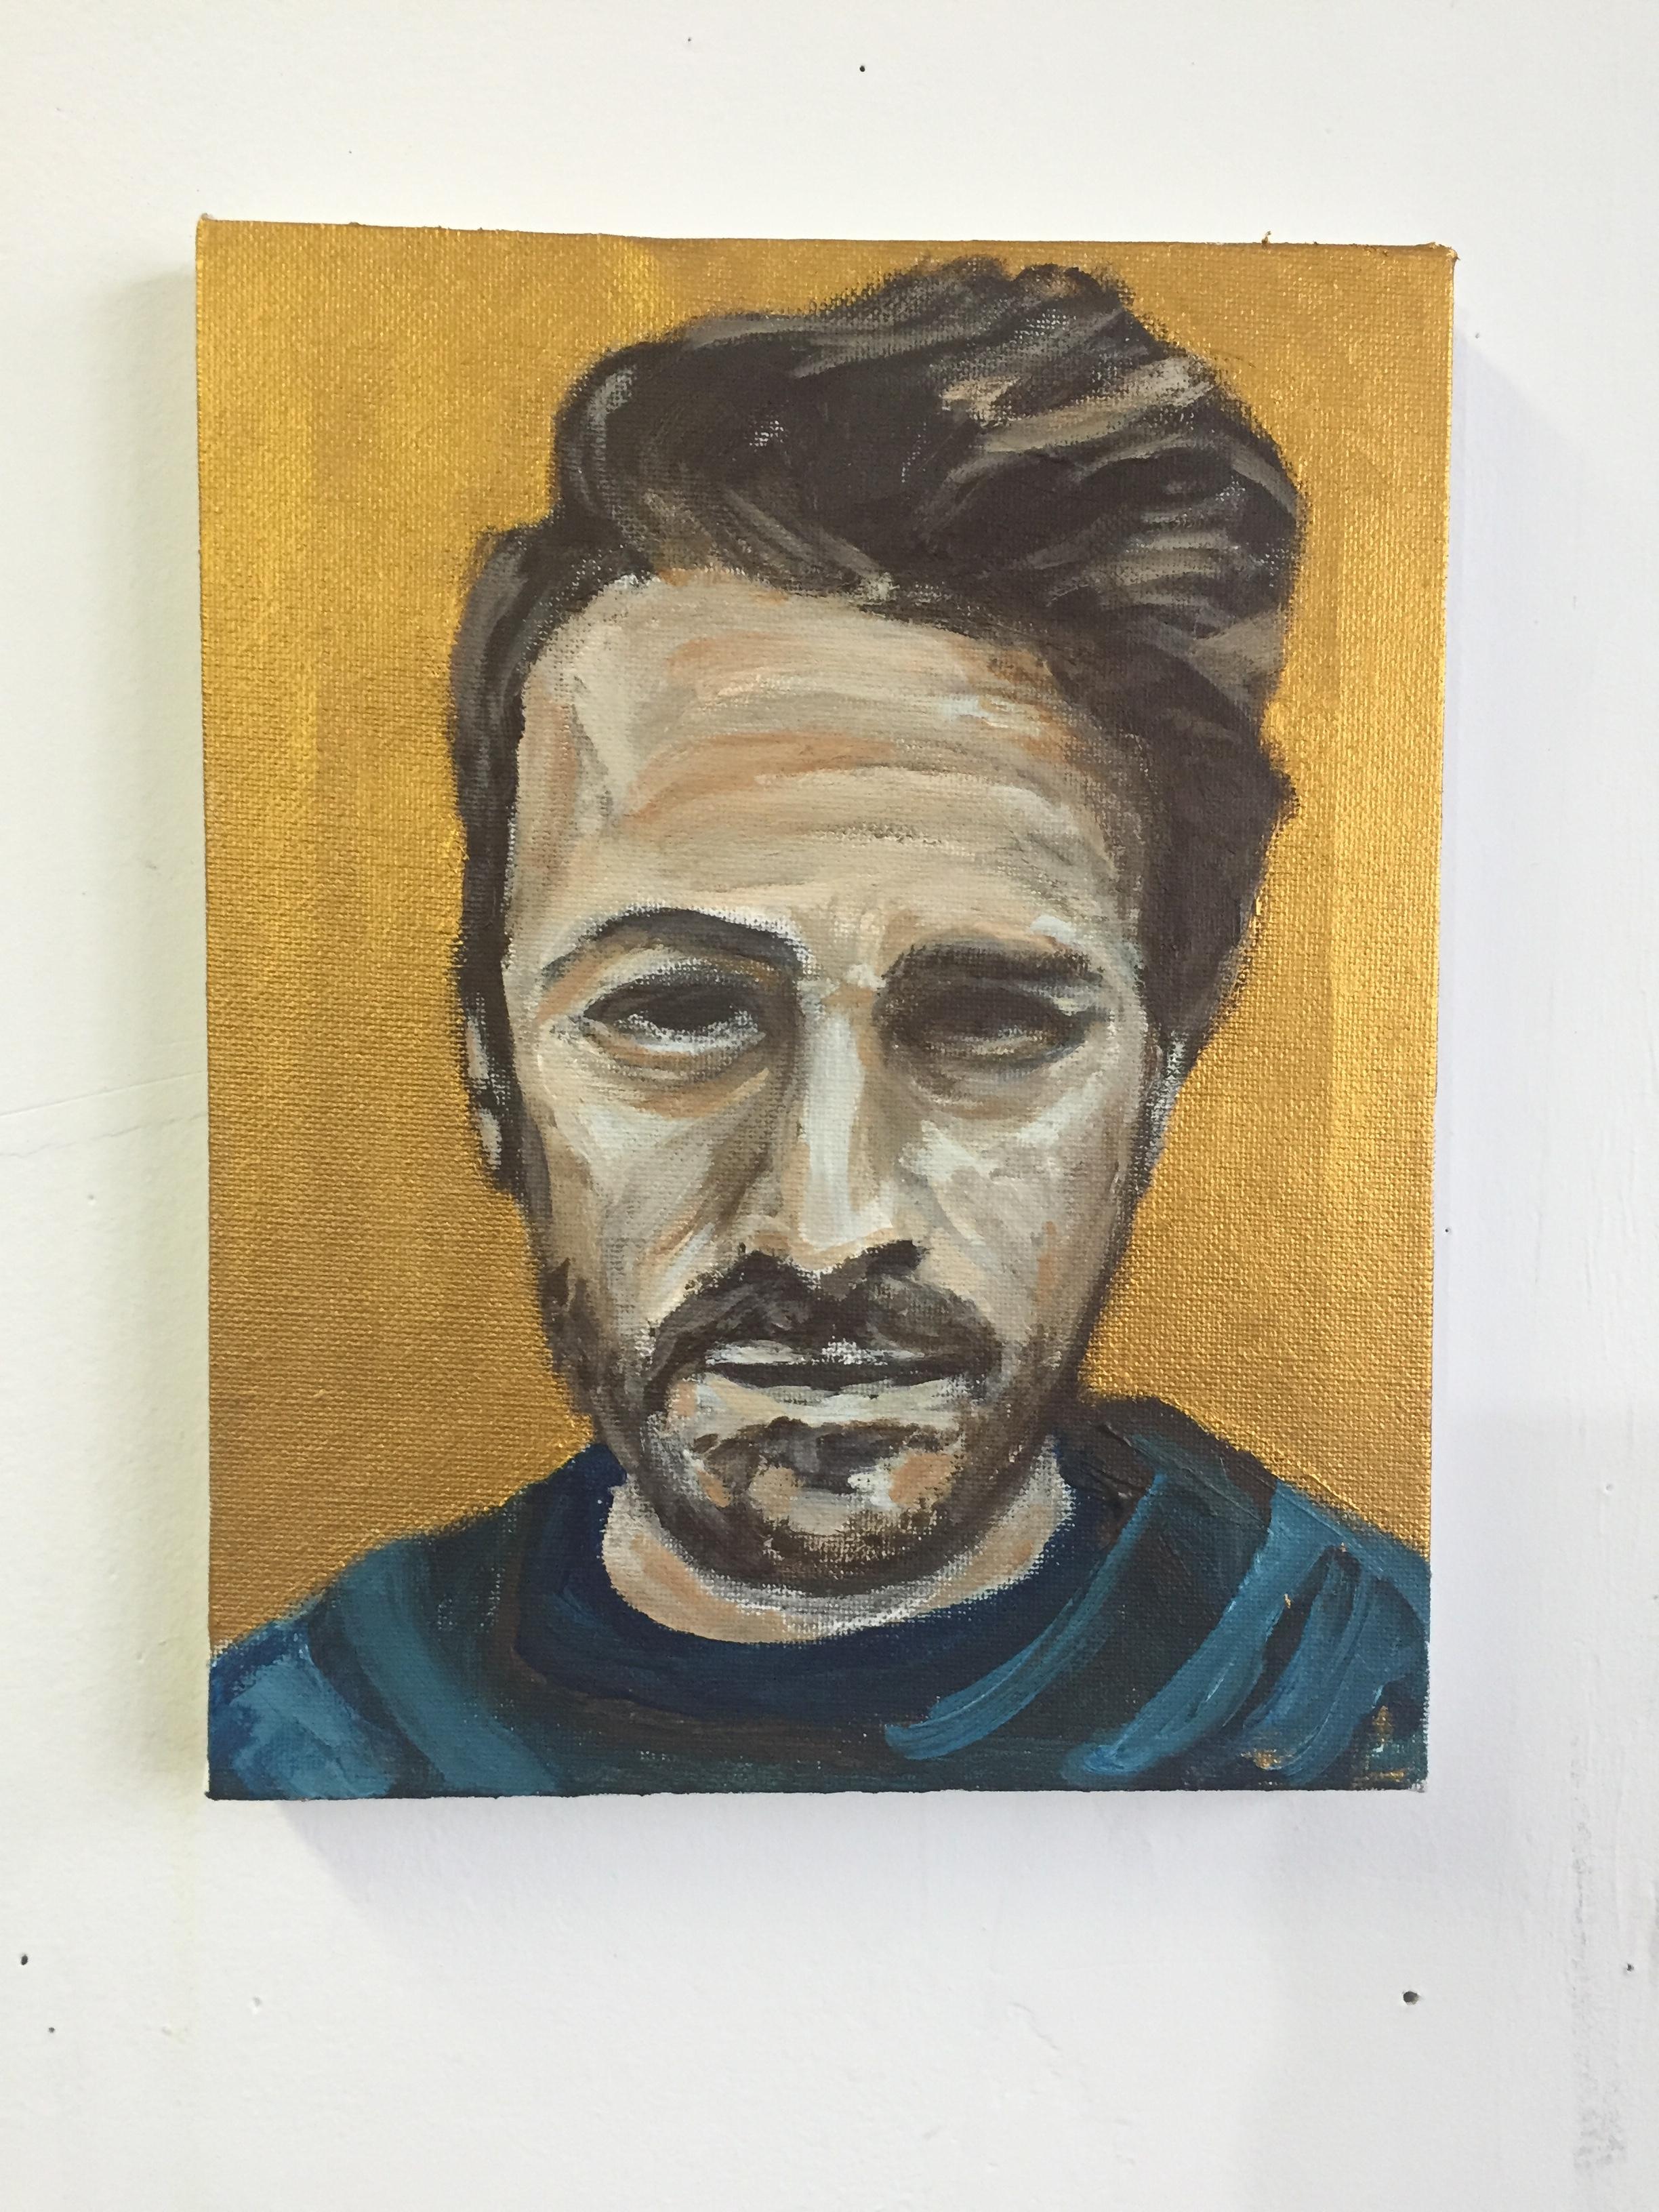 #500, Self Portrait.  Acrylic on Canvass